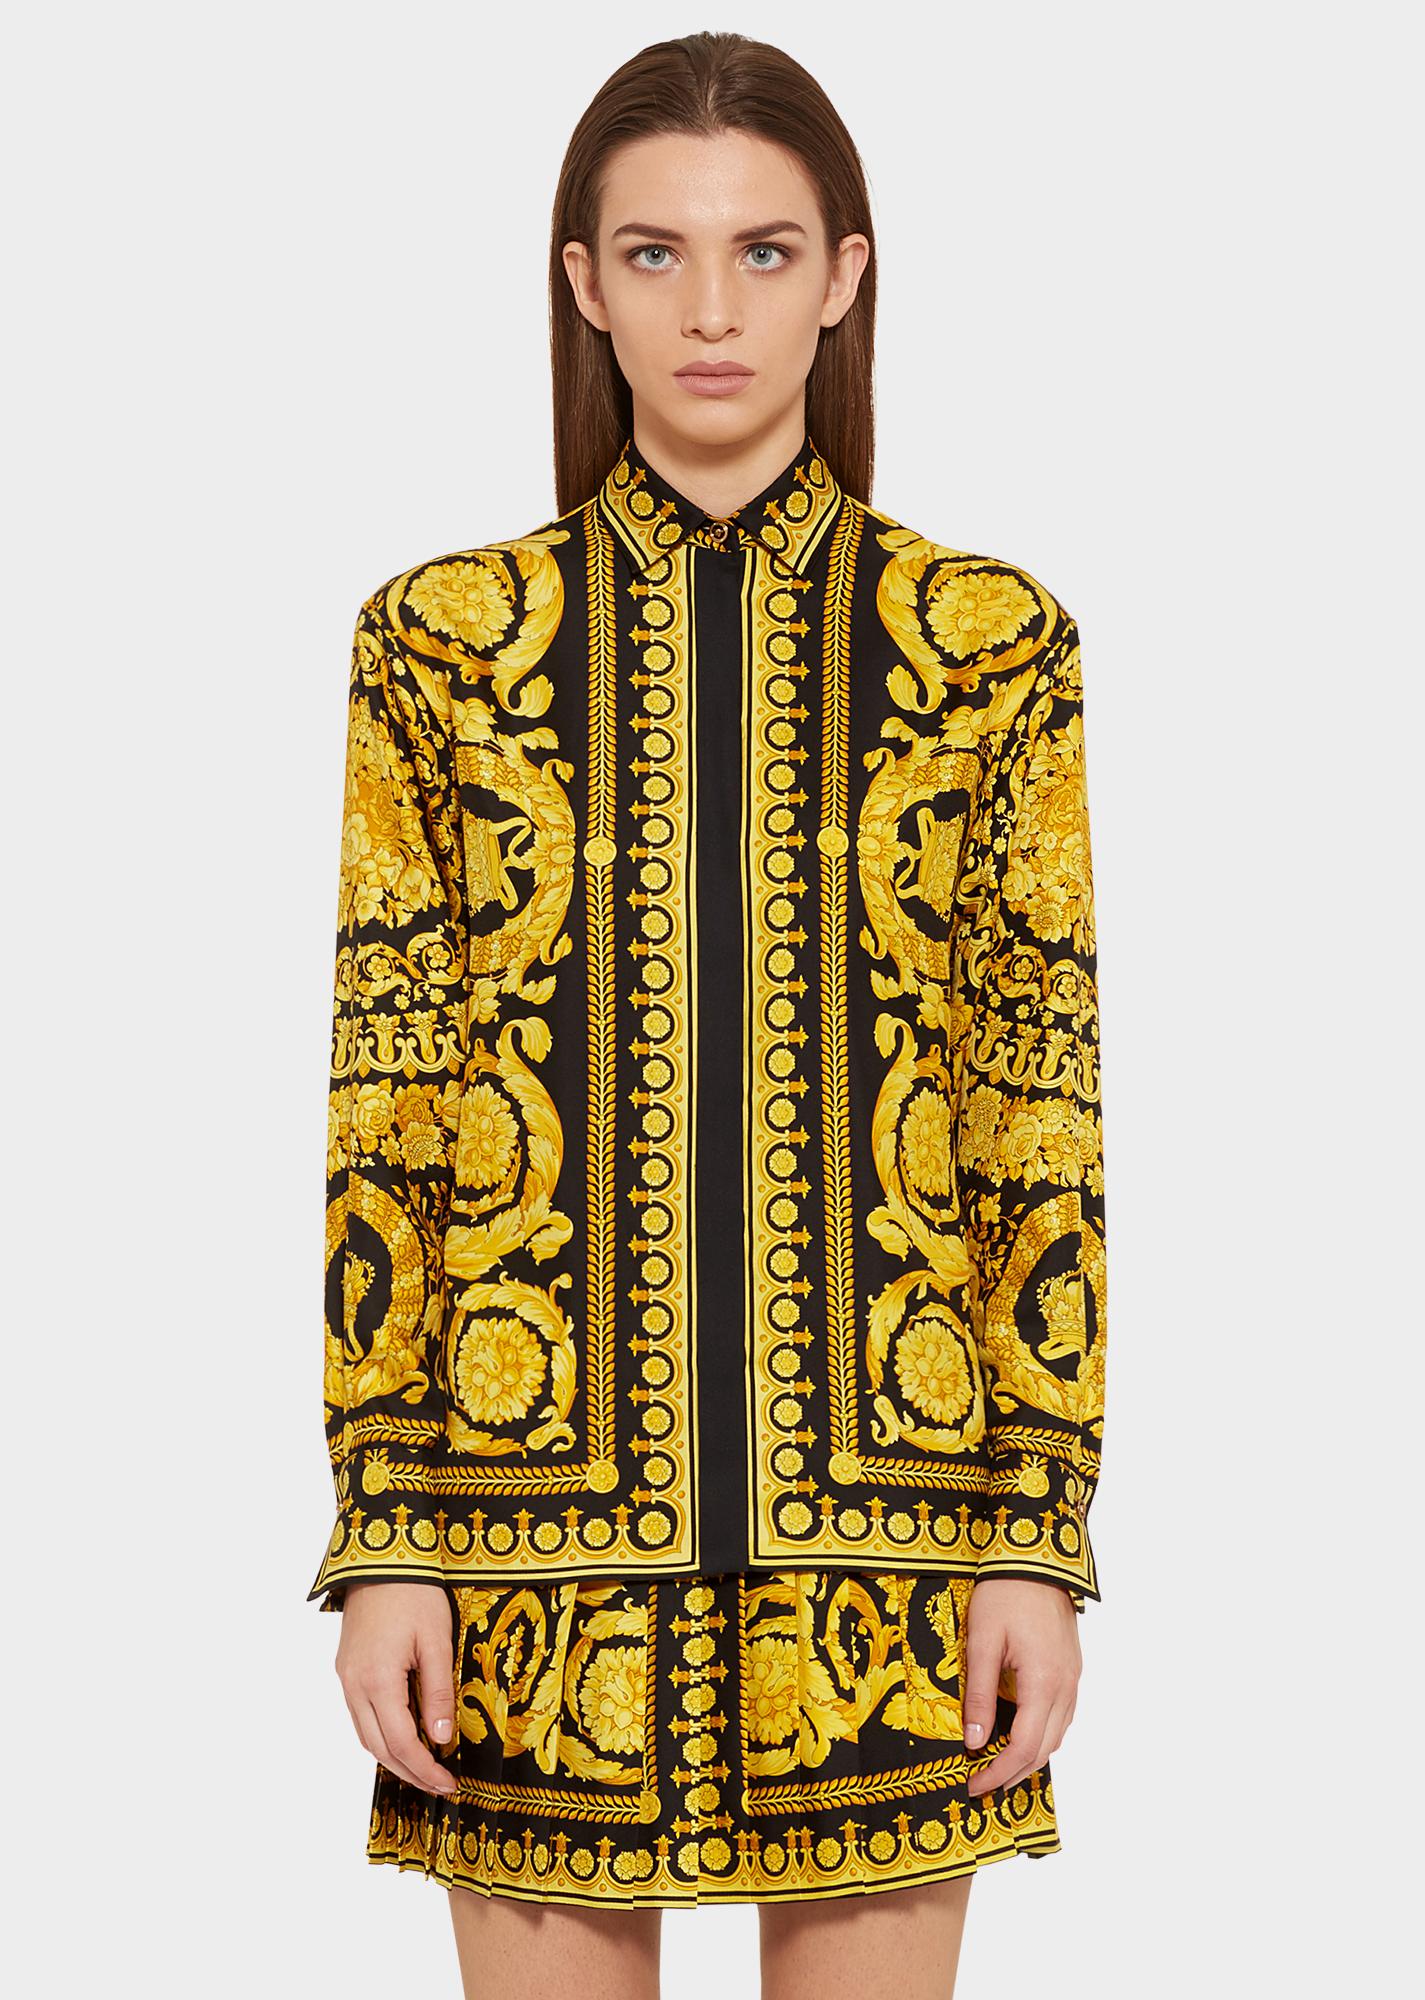 dernier style lisse vif et grand en style Barocco FW'91 Print Silk Shirt for Women | Official Website ...